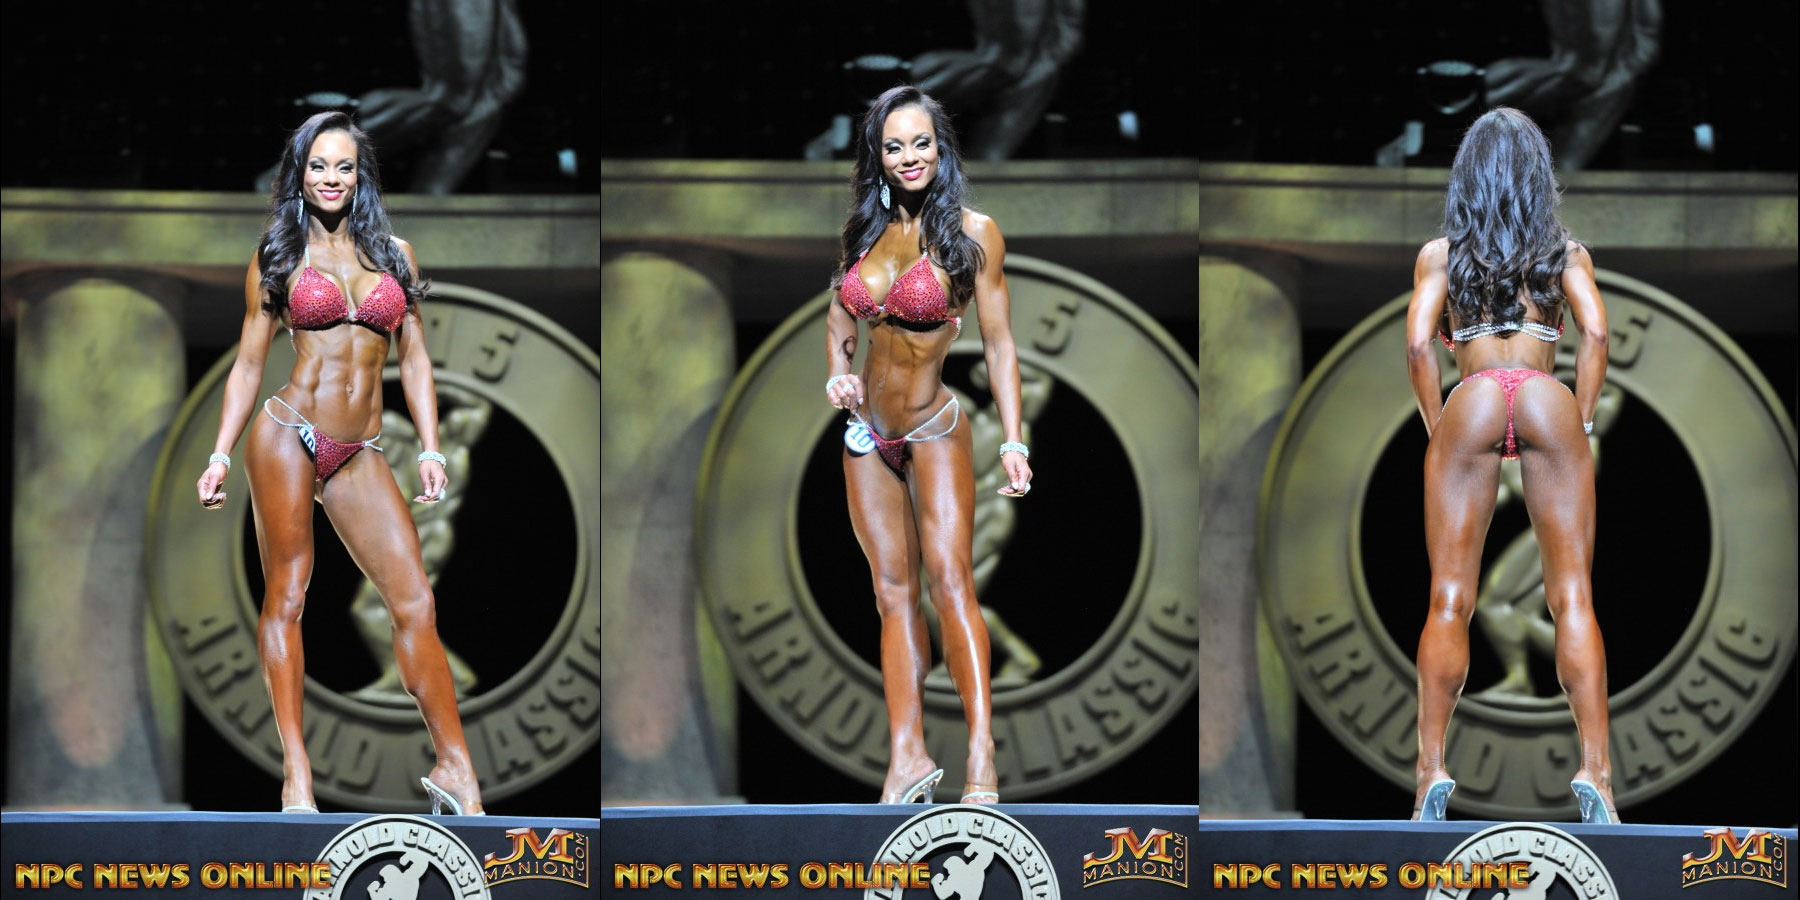 #9 Nicole Ankney